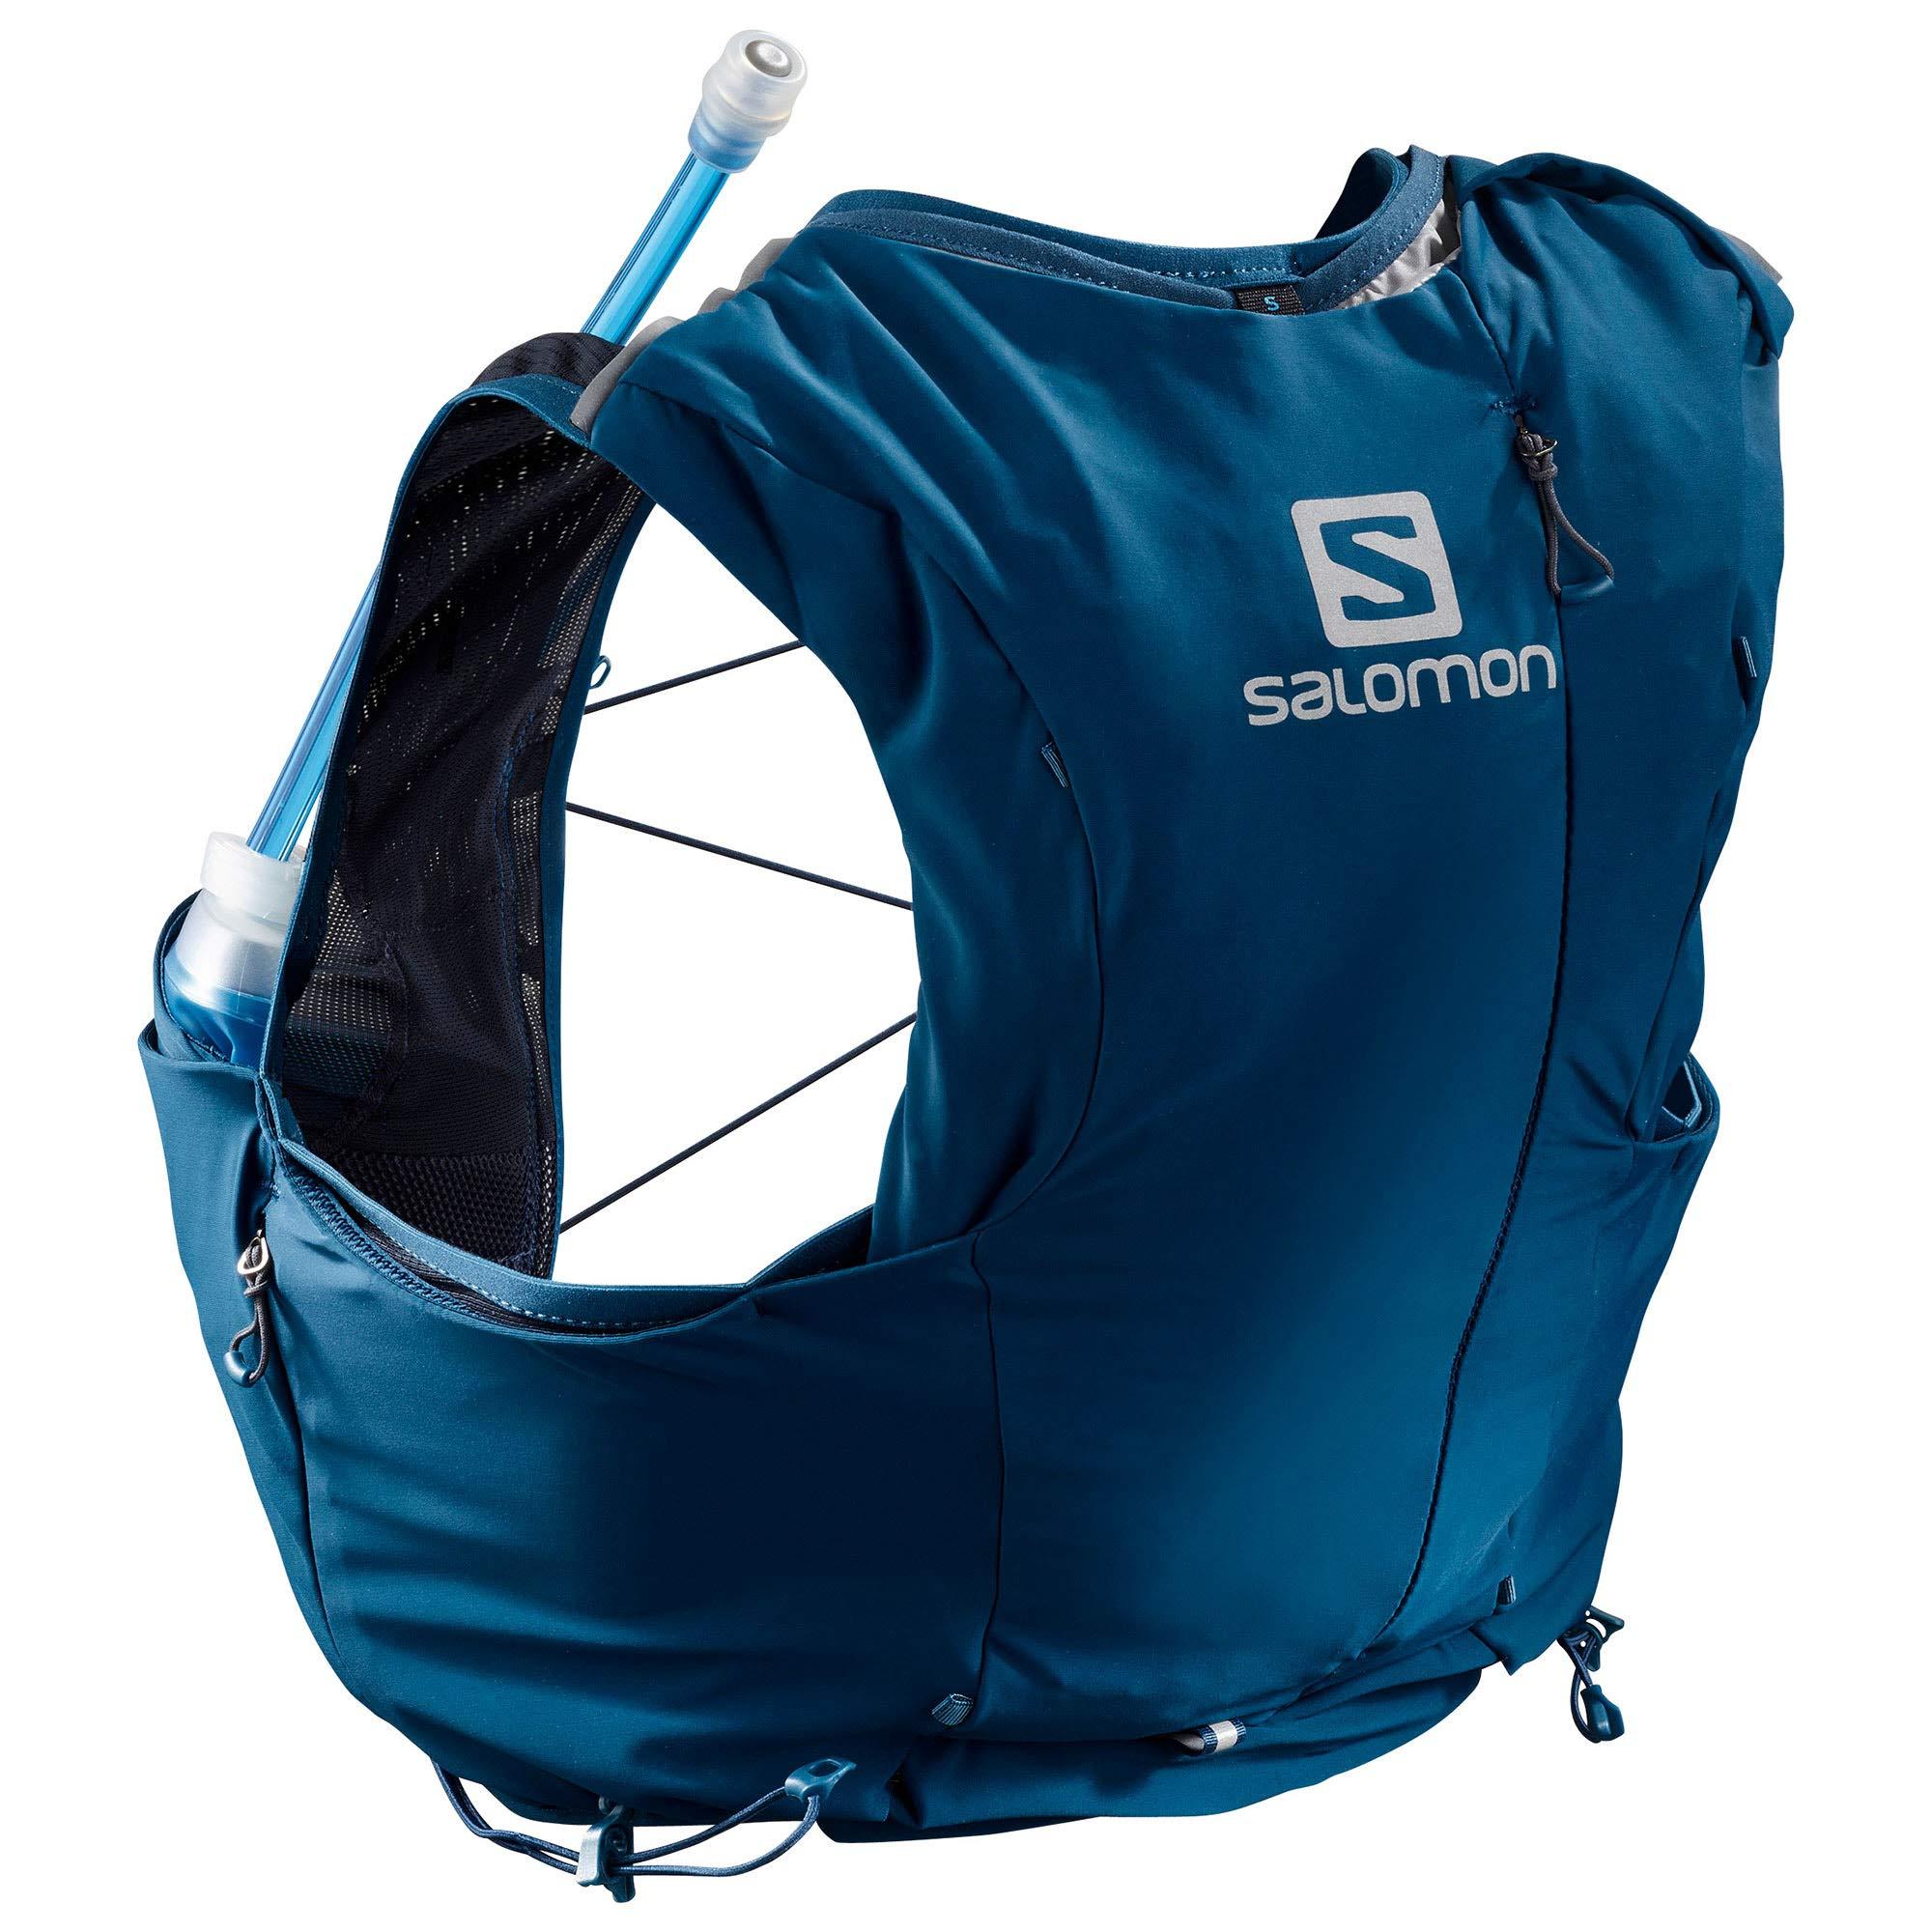 Salomon Women's Adv Skin 8 Set Hydration Stretch Pack, Poseidon/Night, XX-Small by Salomon (Image #1)